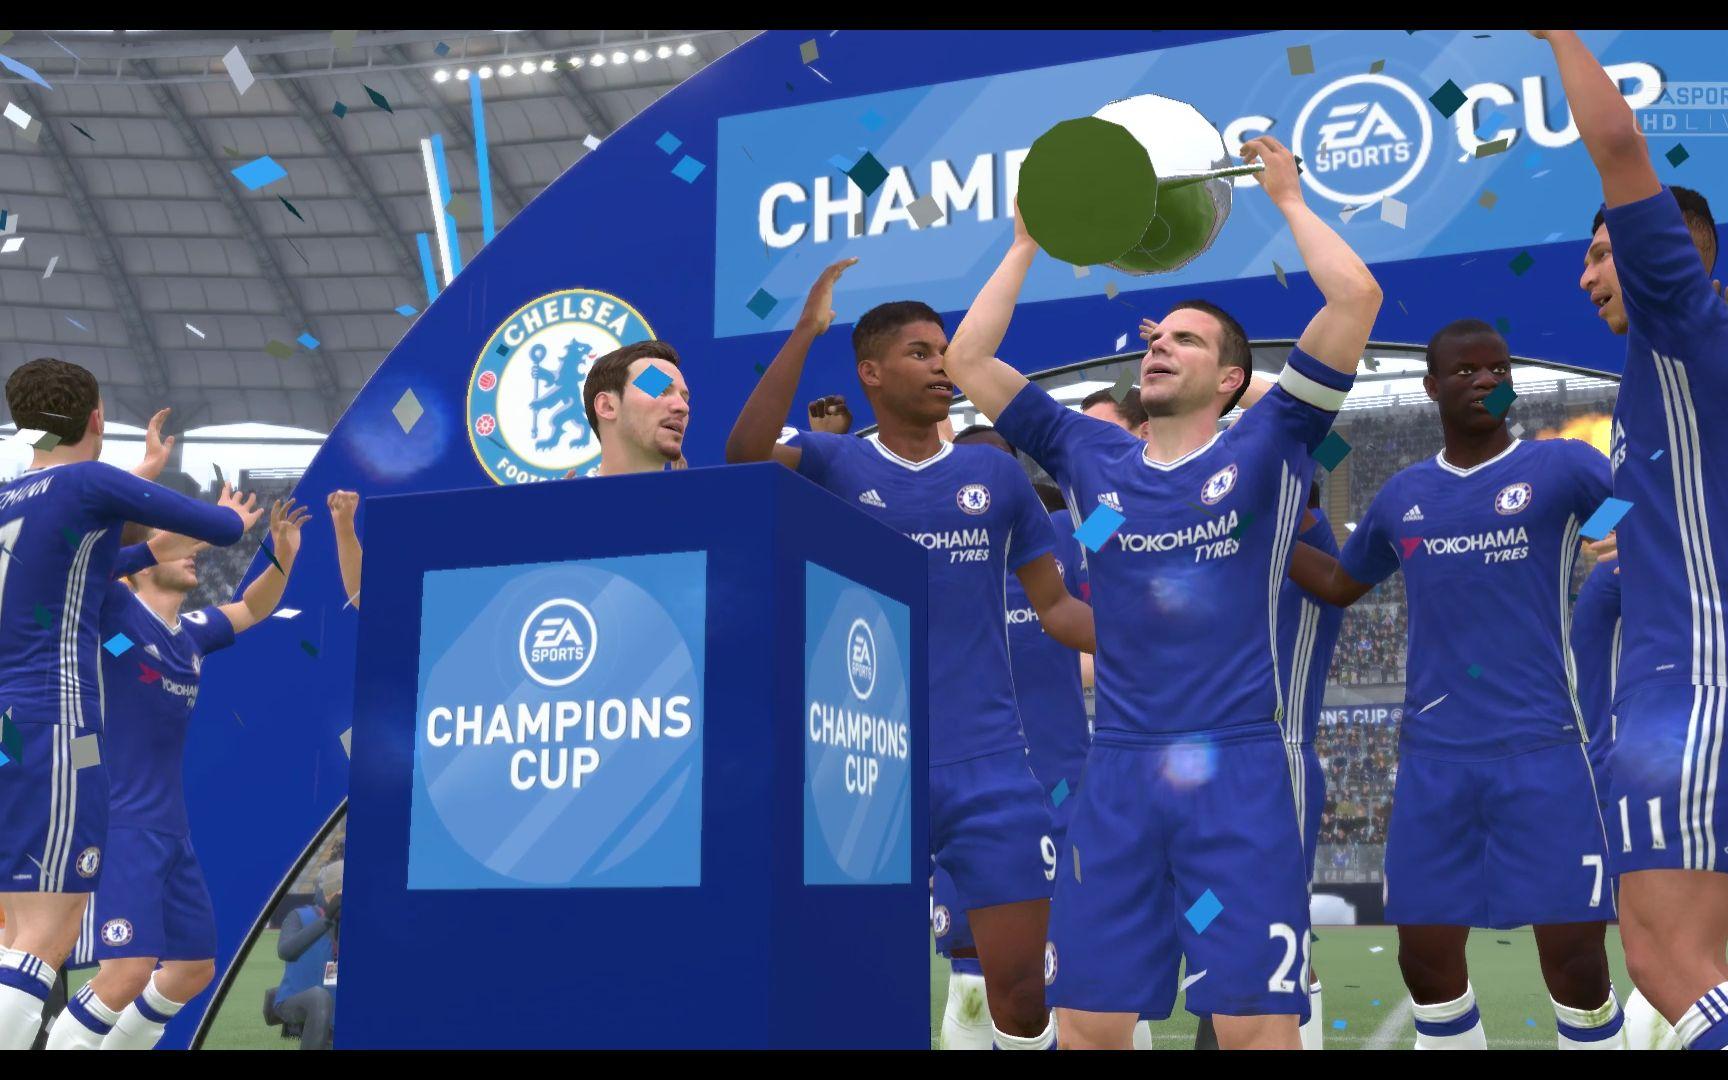 fifa17欧冠决赛拉师傅帽子戏法切尔西加时4球逆转图片